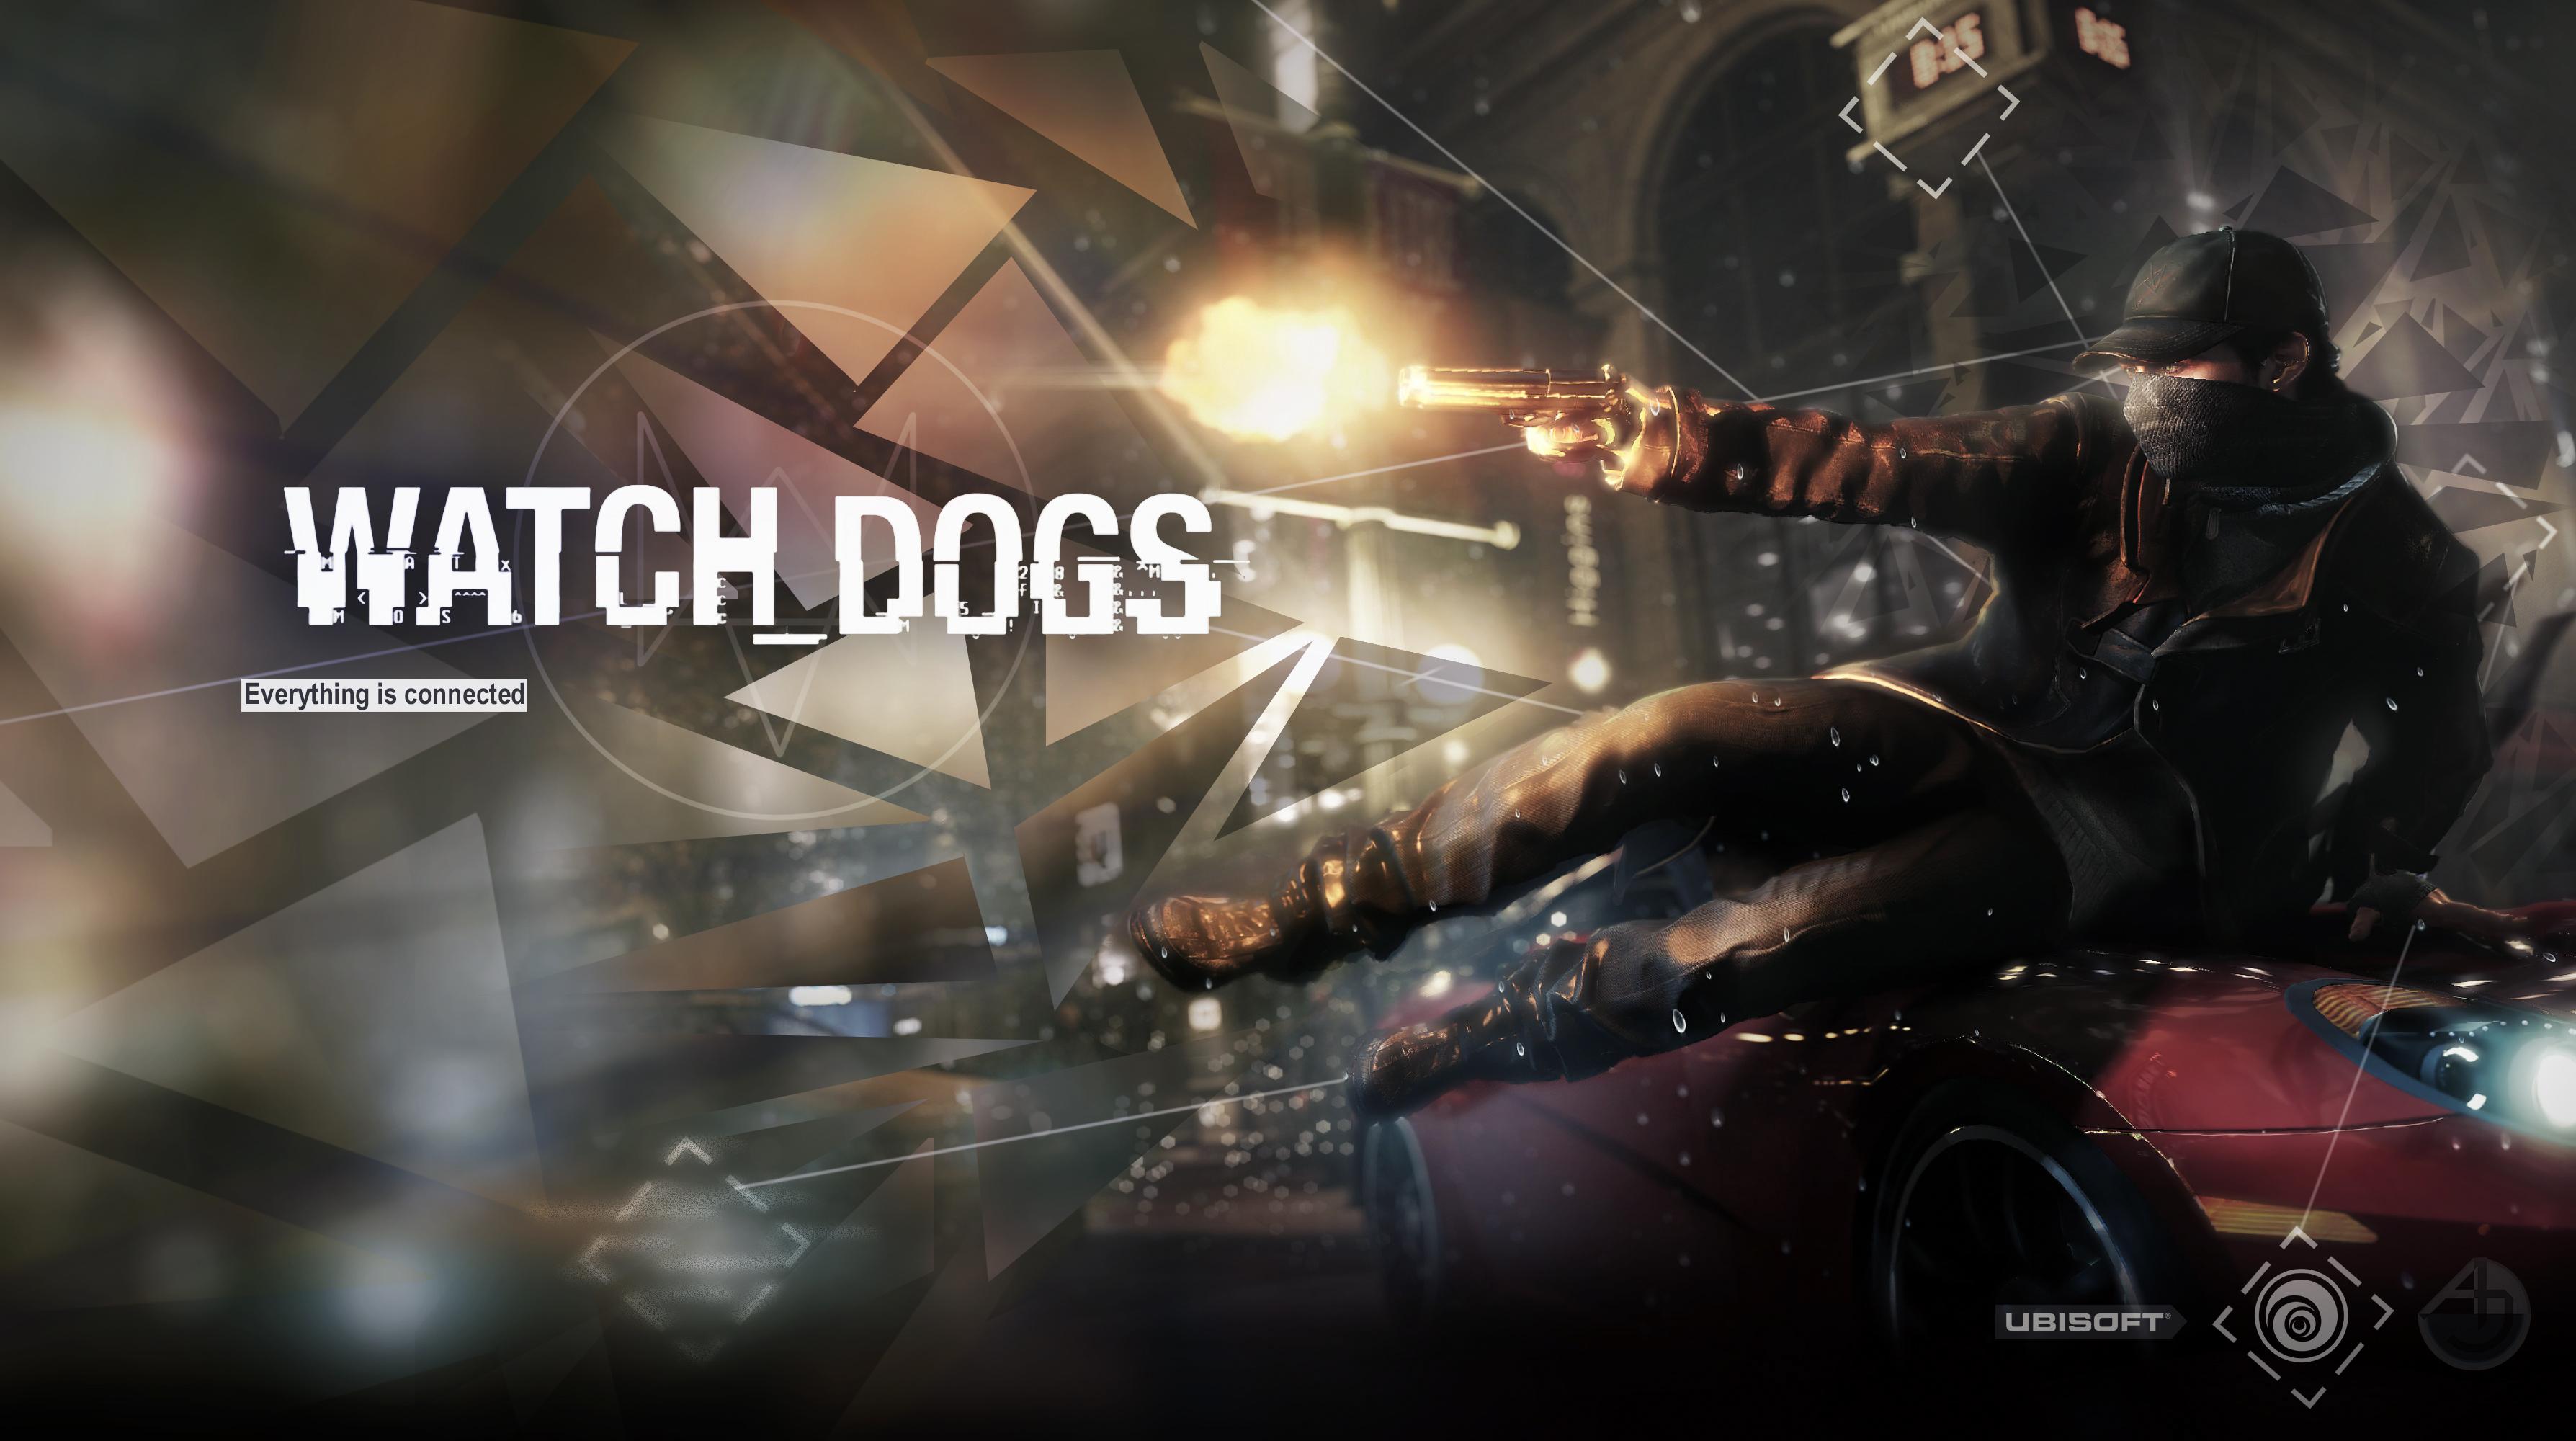 watch dogs wallpaper 3576x2000